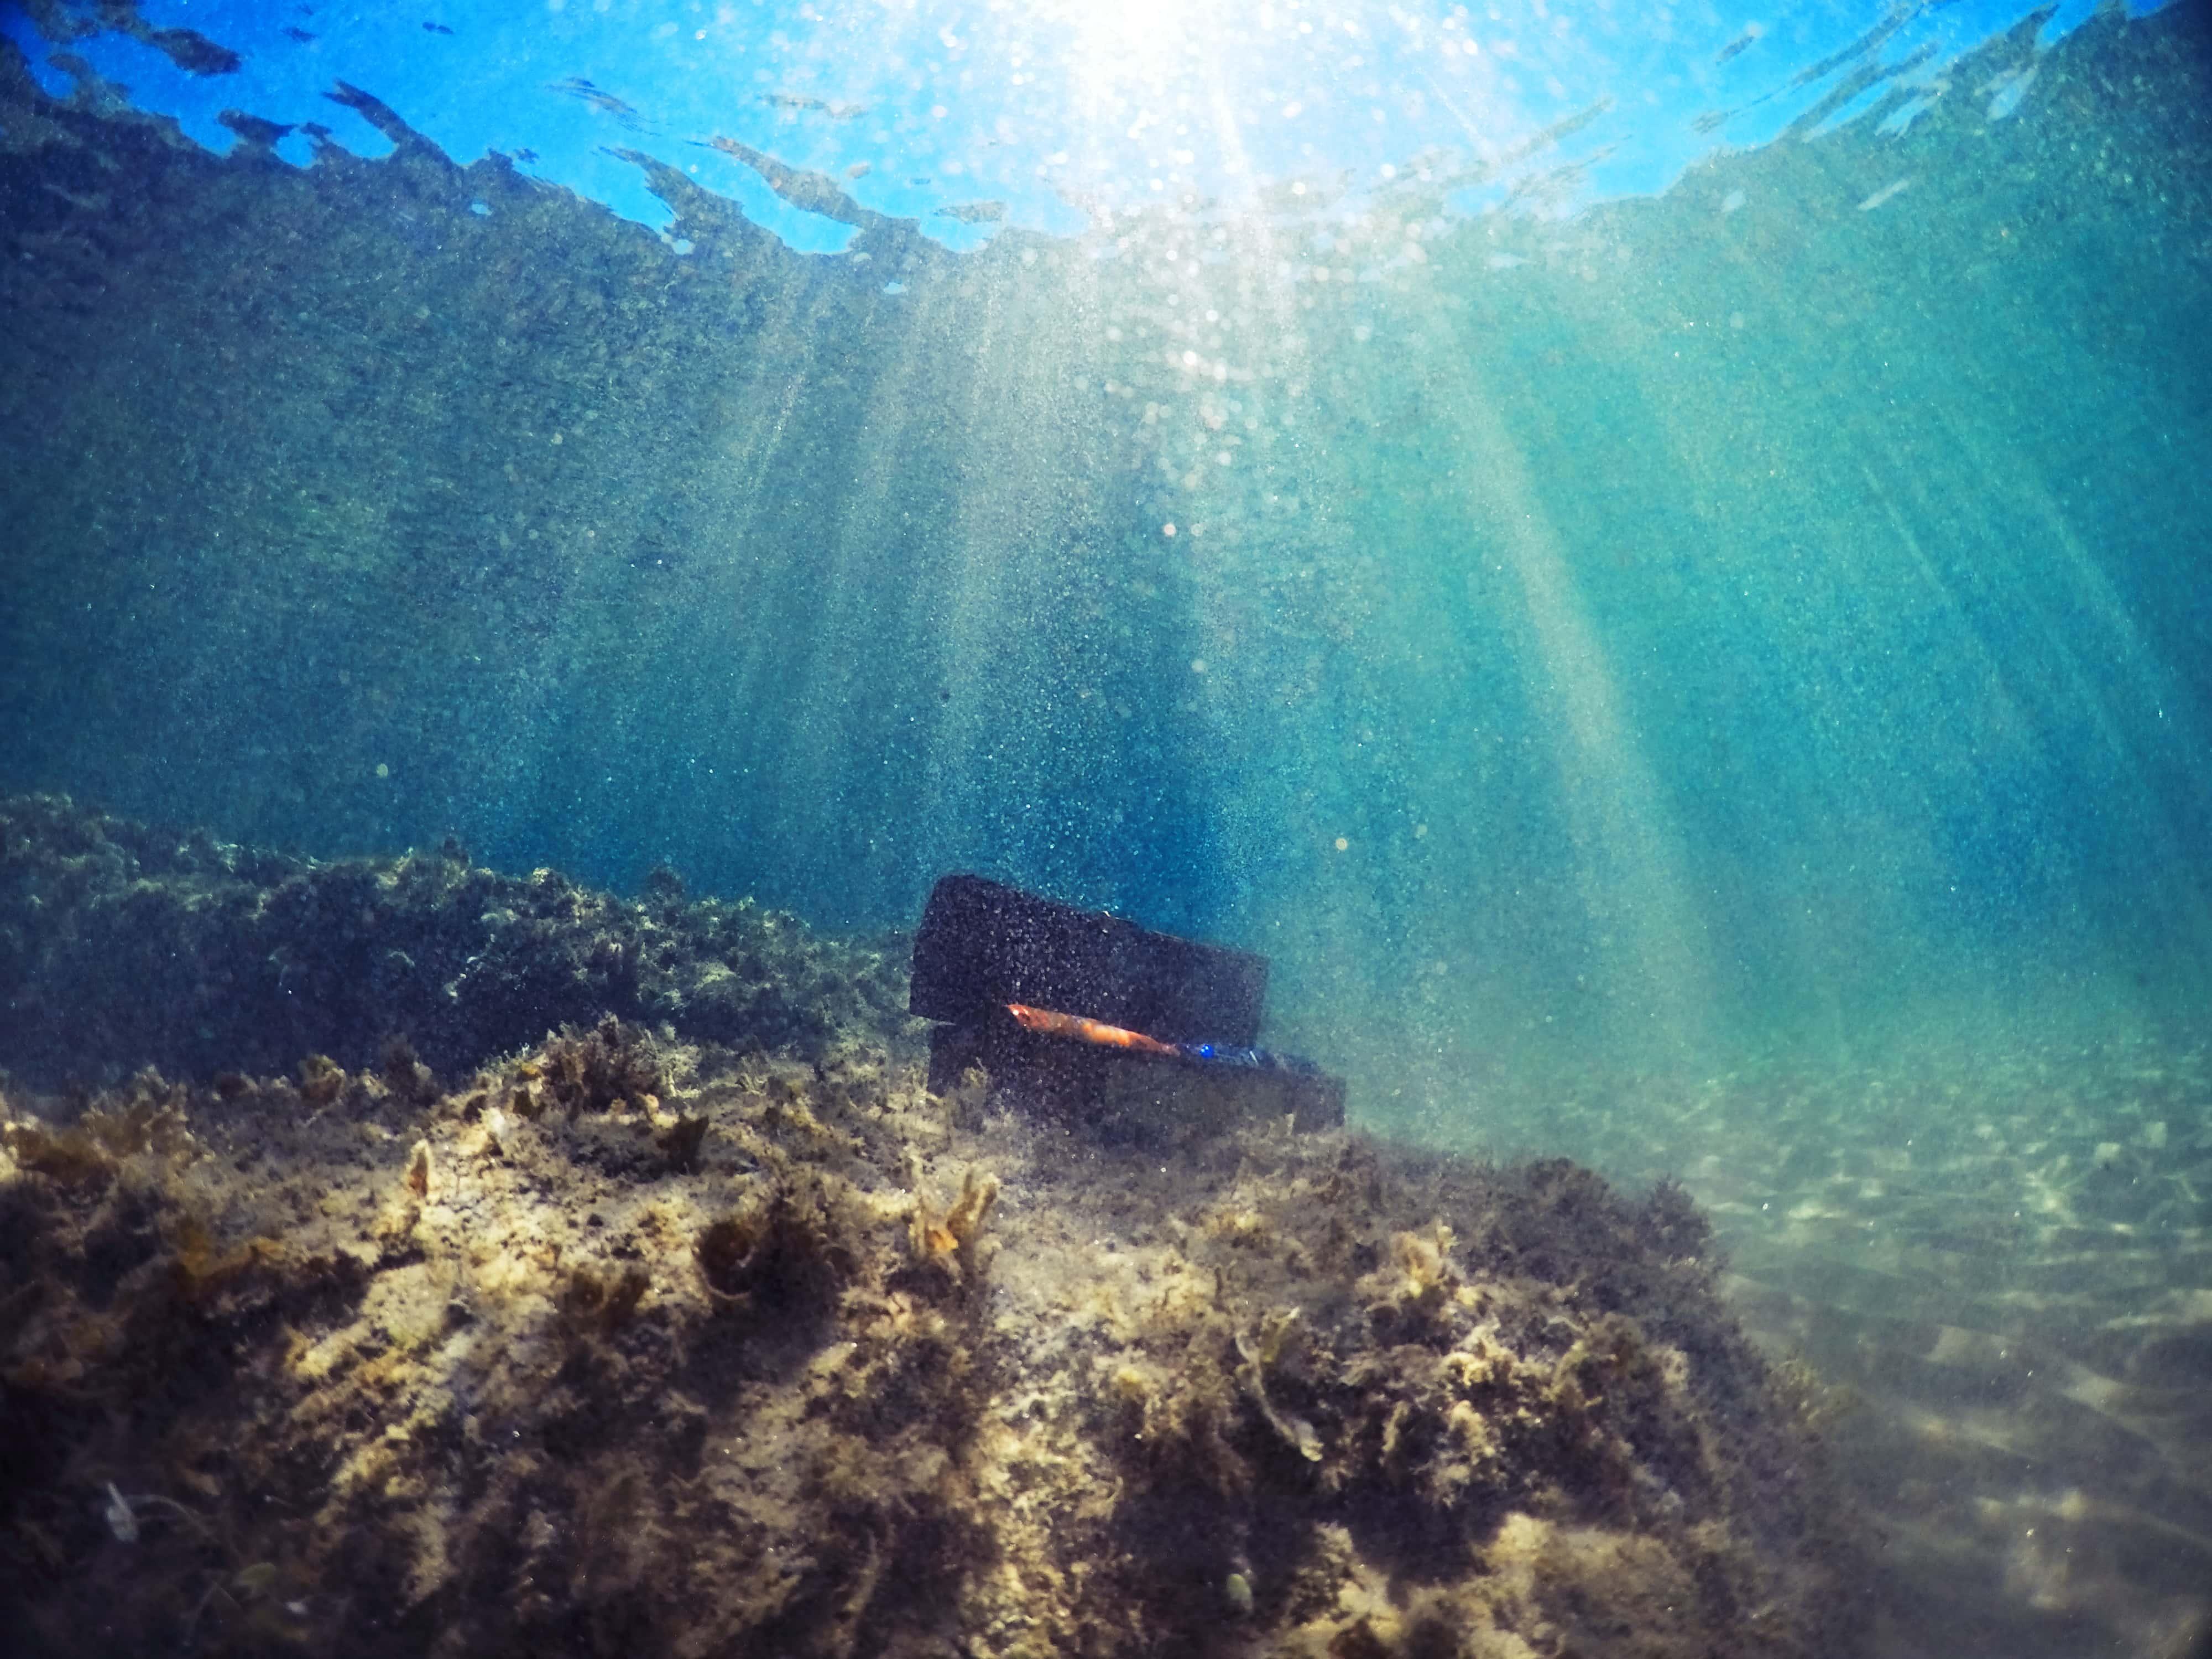 Treasure underwater.